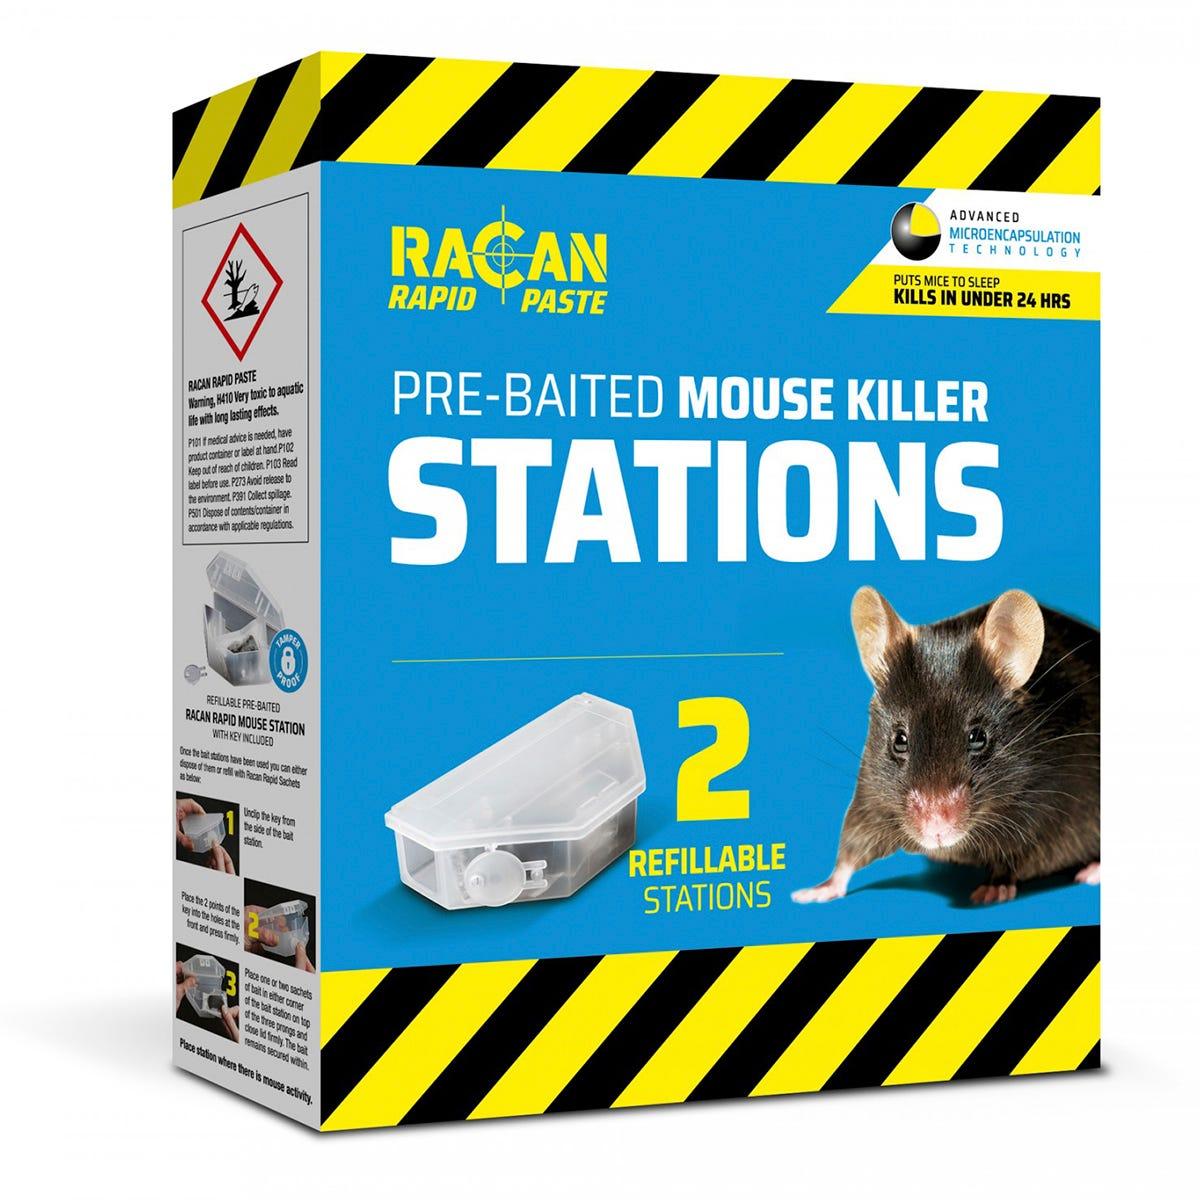 Racan Rapid Pre-Baited Mouse Killer Station - Pk 2